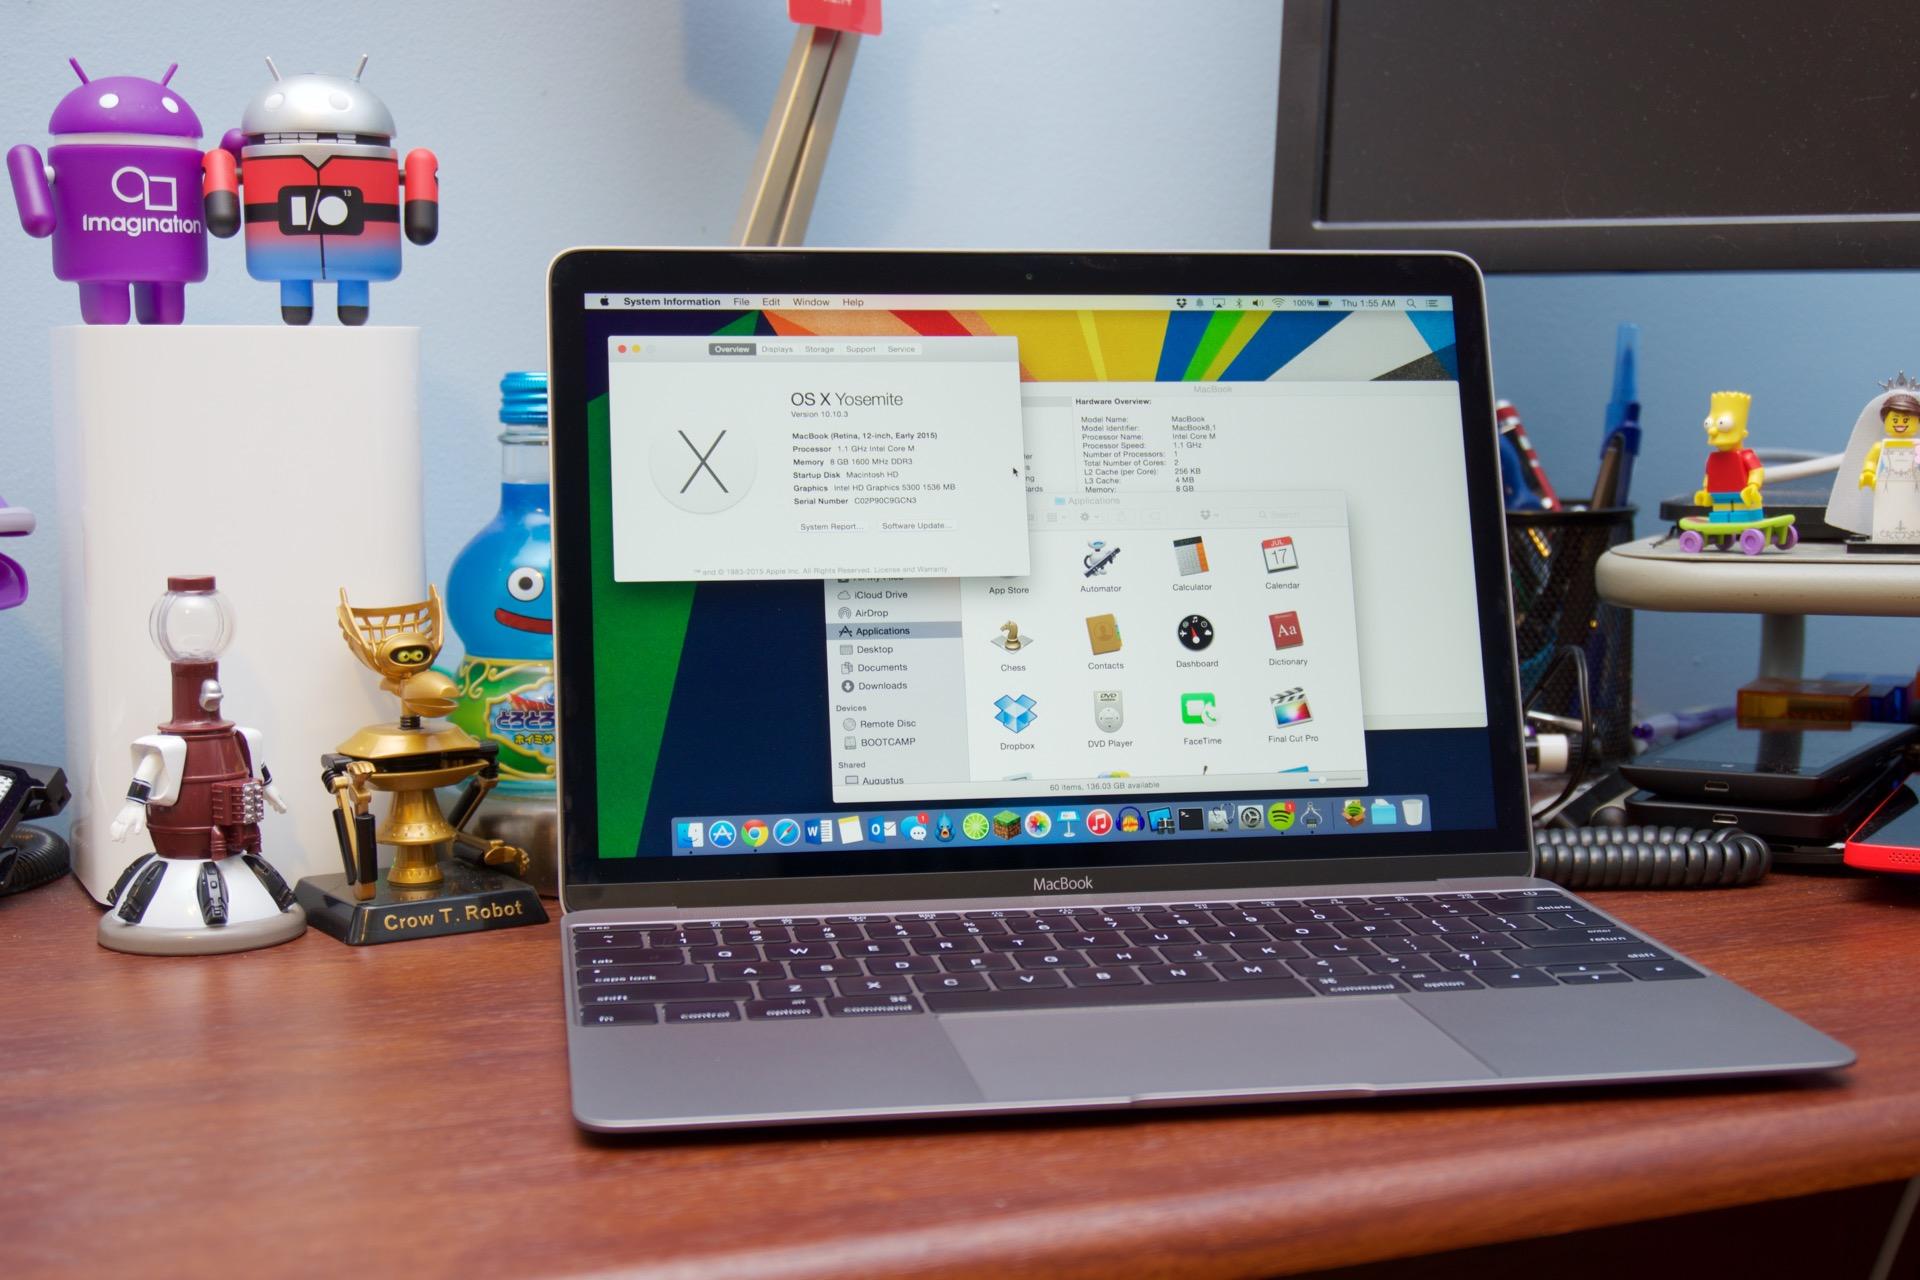 Skinny, fanless laptops like Apple's MacBook use Core M CPUs instead.